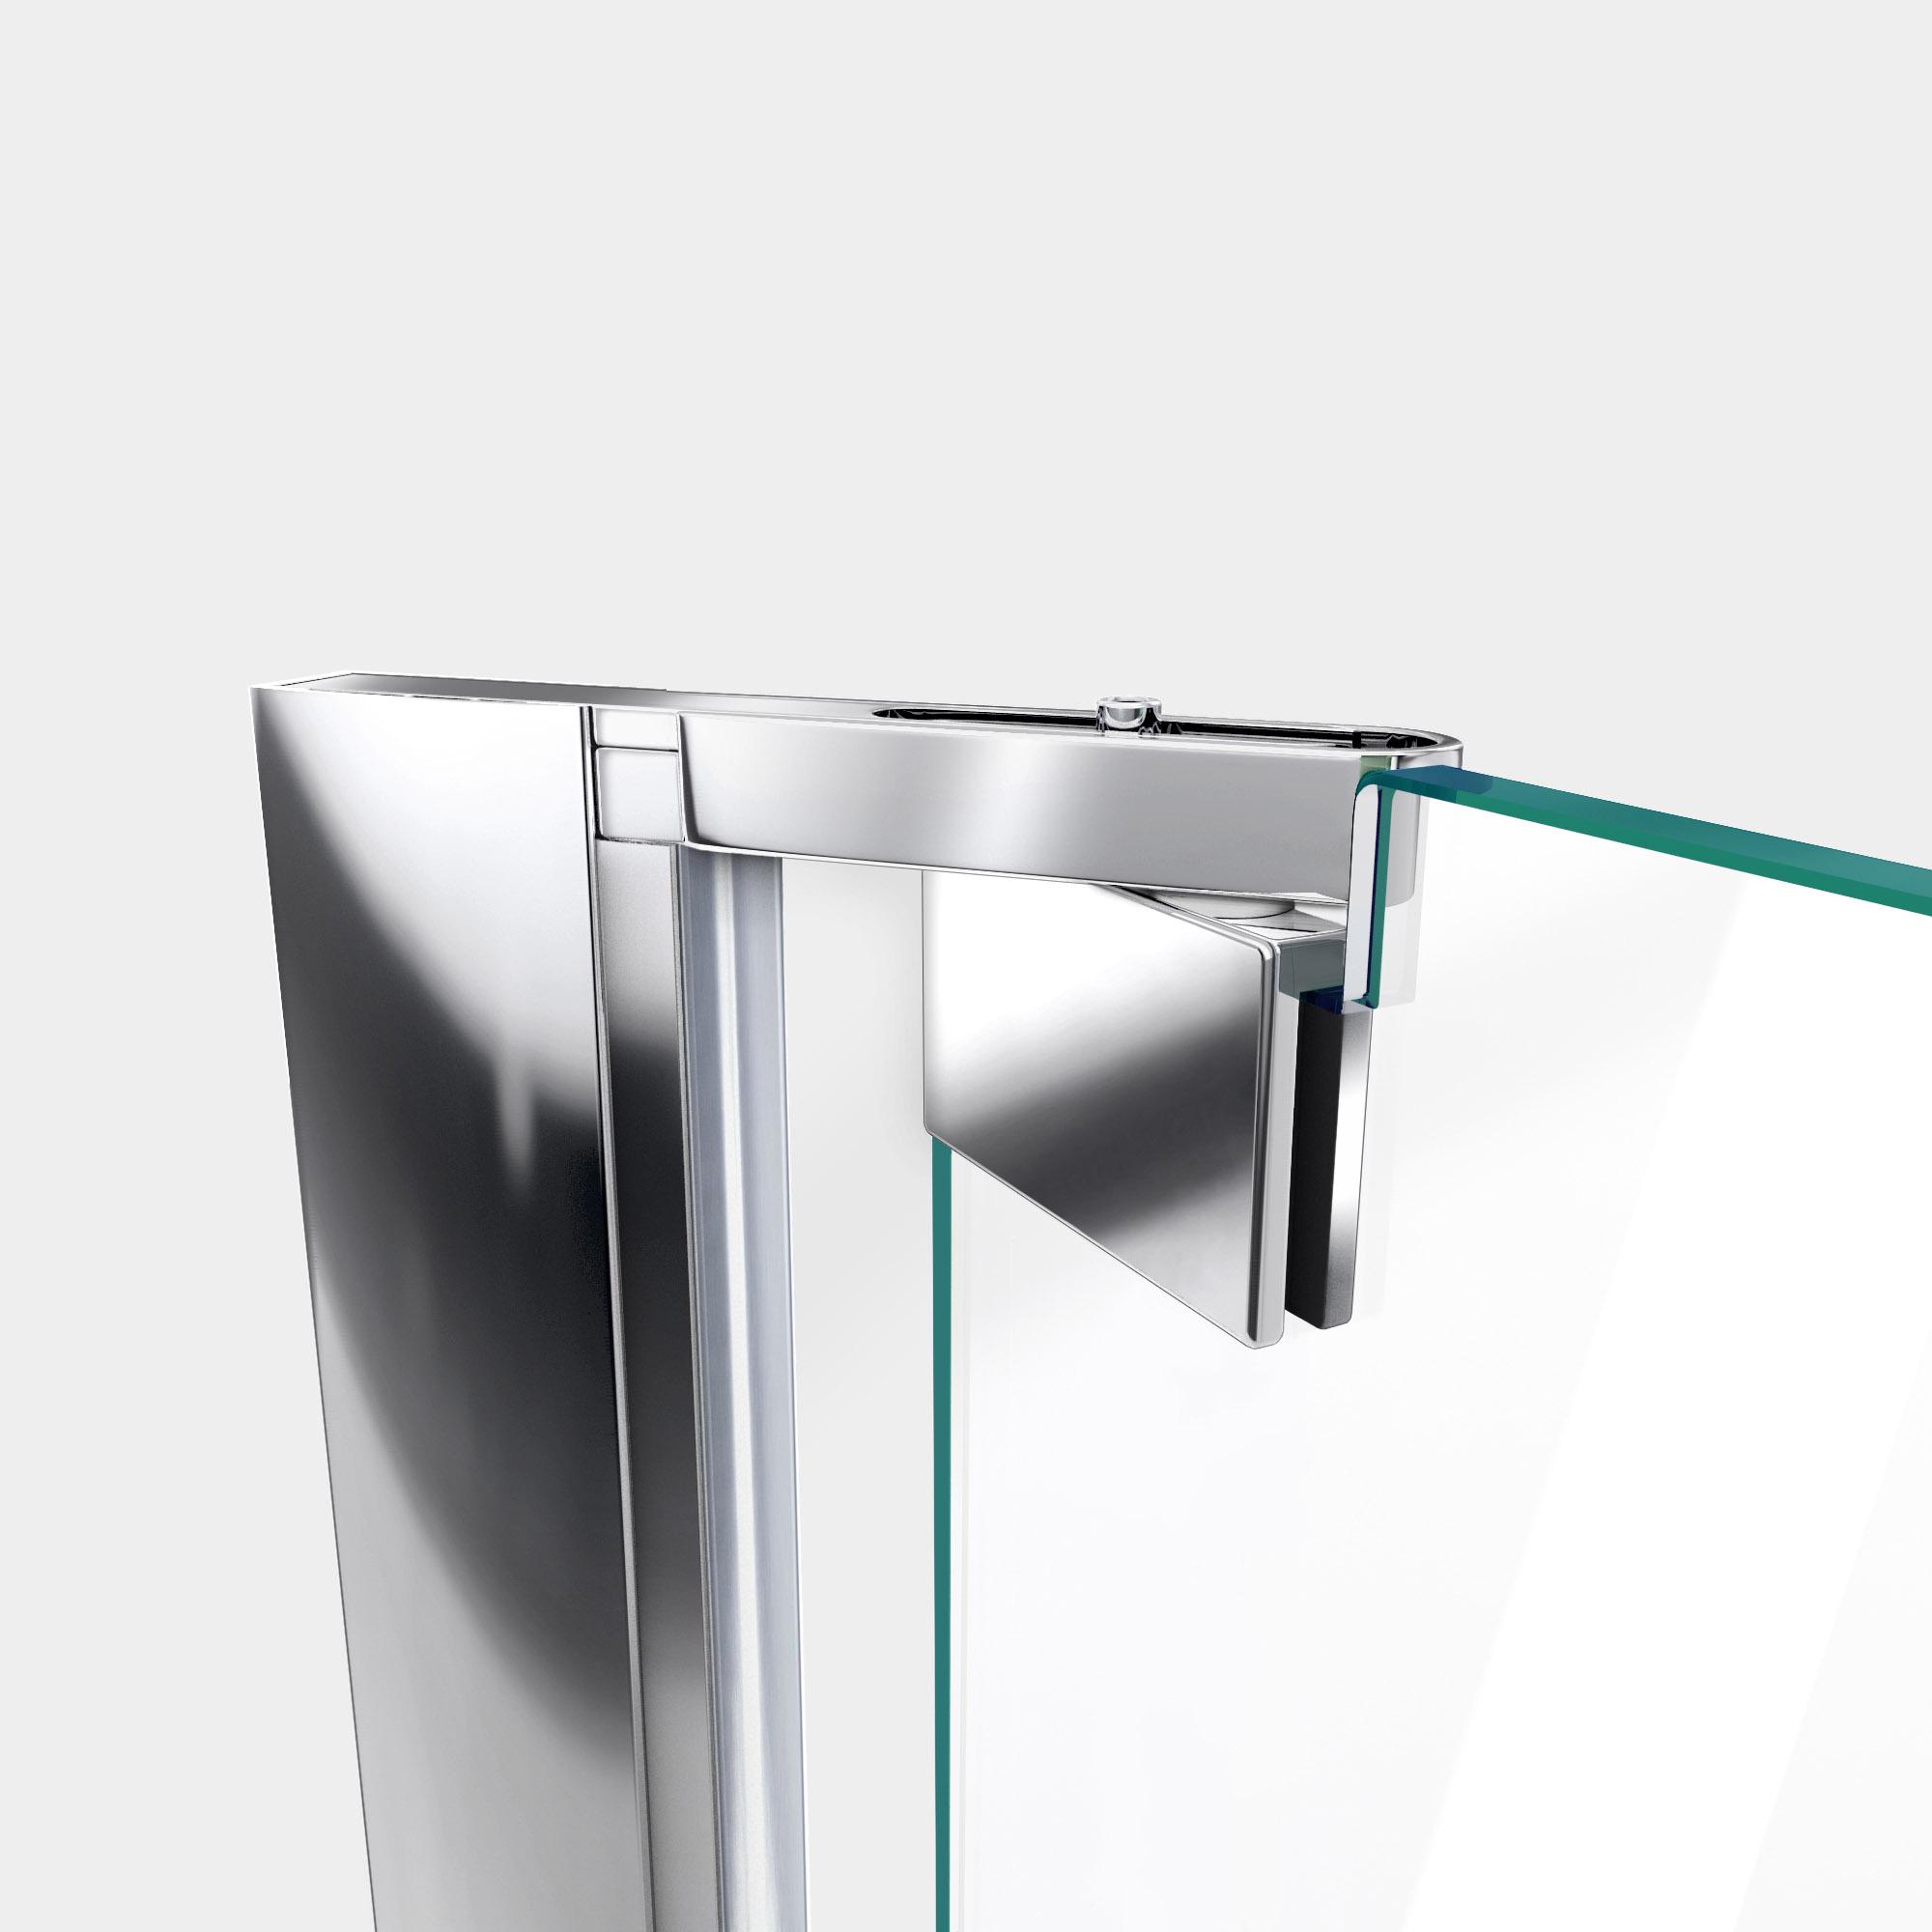 ls-model-shower-duncan